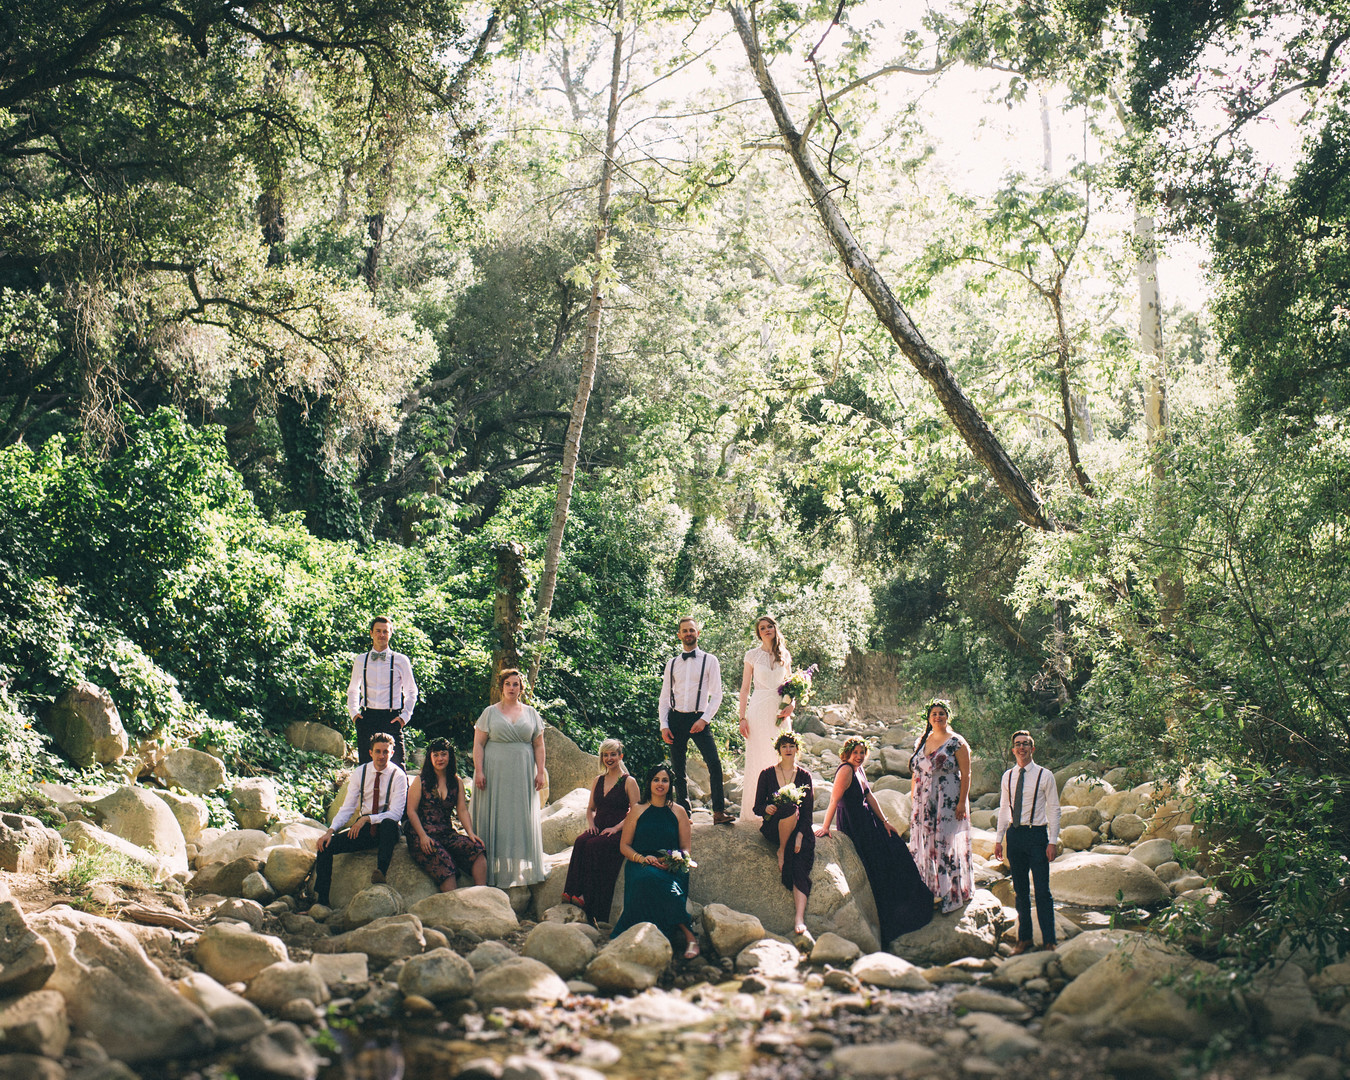 www.santabarbarawedding.com | Sarah Katherine Davis Photography | Santa Barbara Museum of Natural History | Wild Heart Events | Ella and Louie | Bridal Party on the Rocks